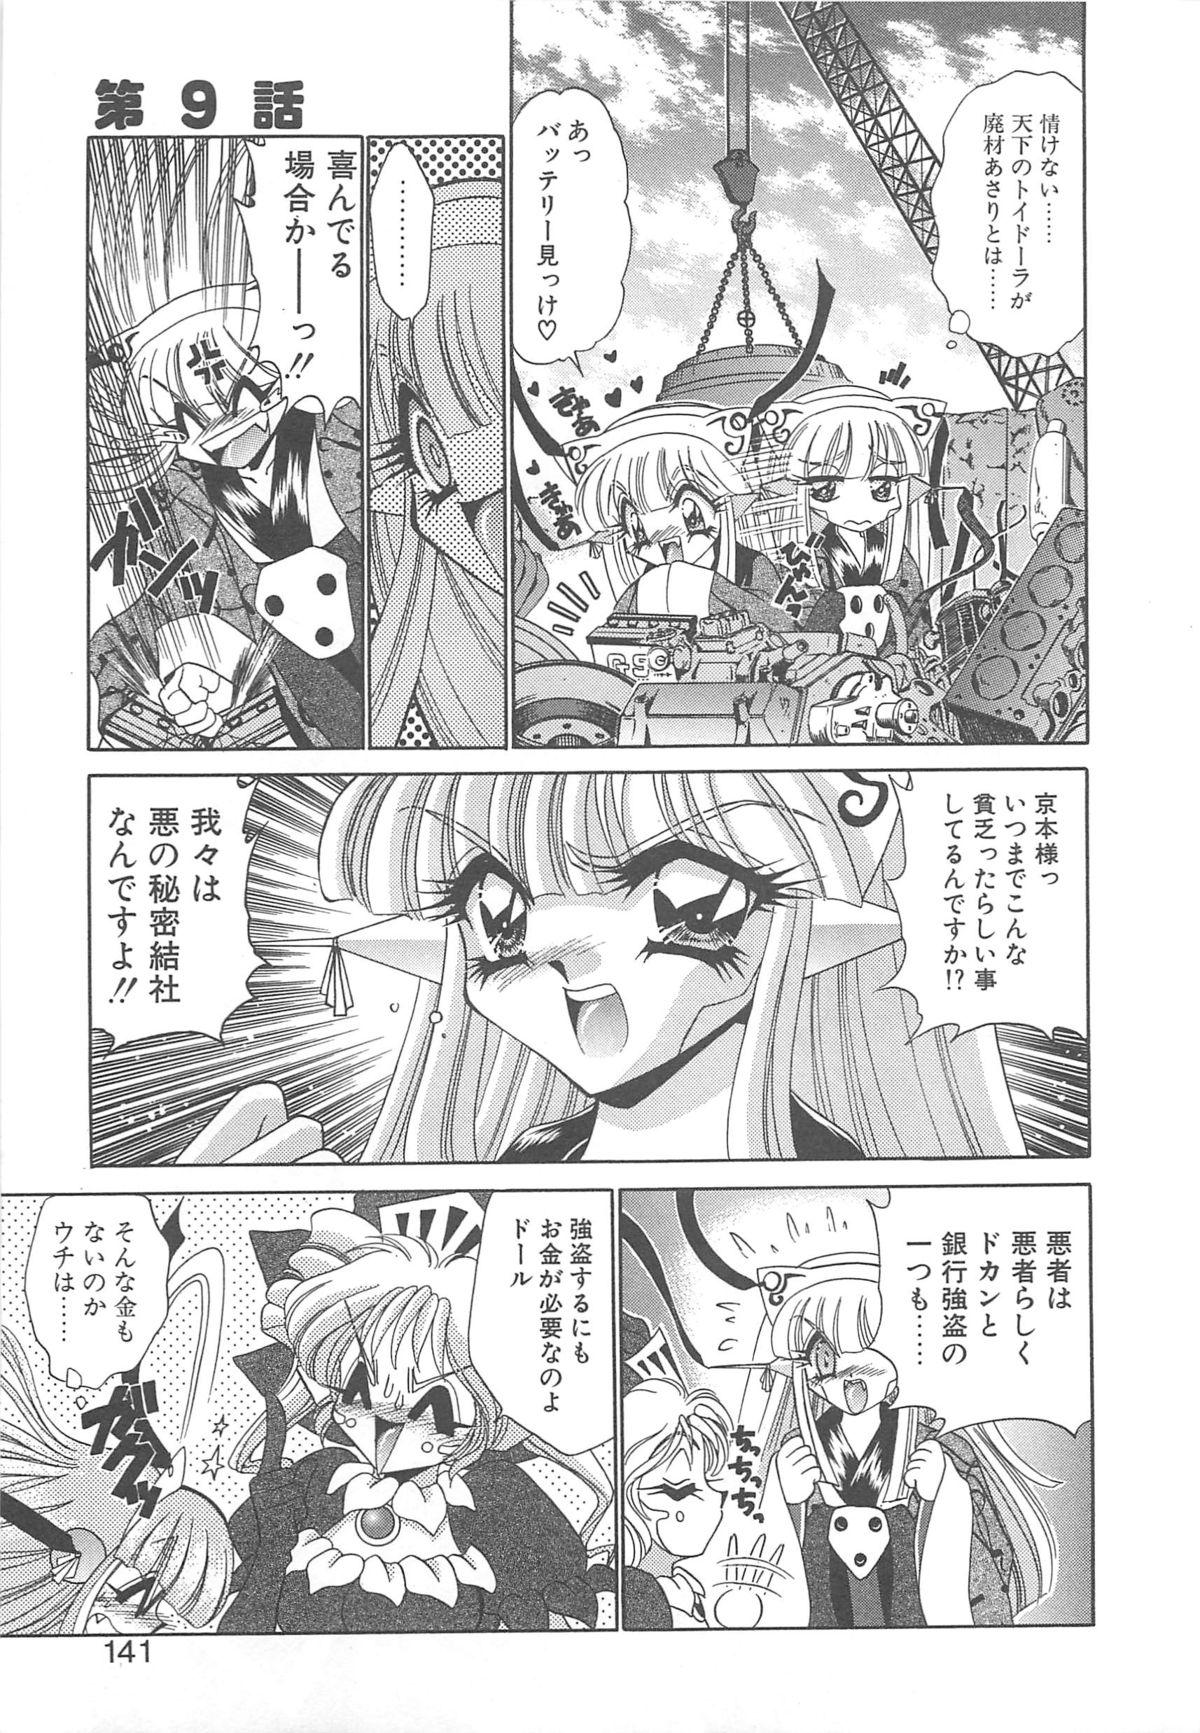 Kigurumi Sentai Quiltian 139